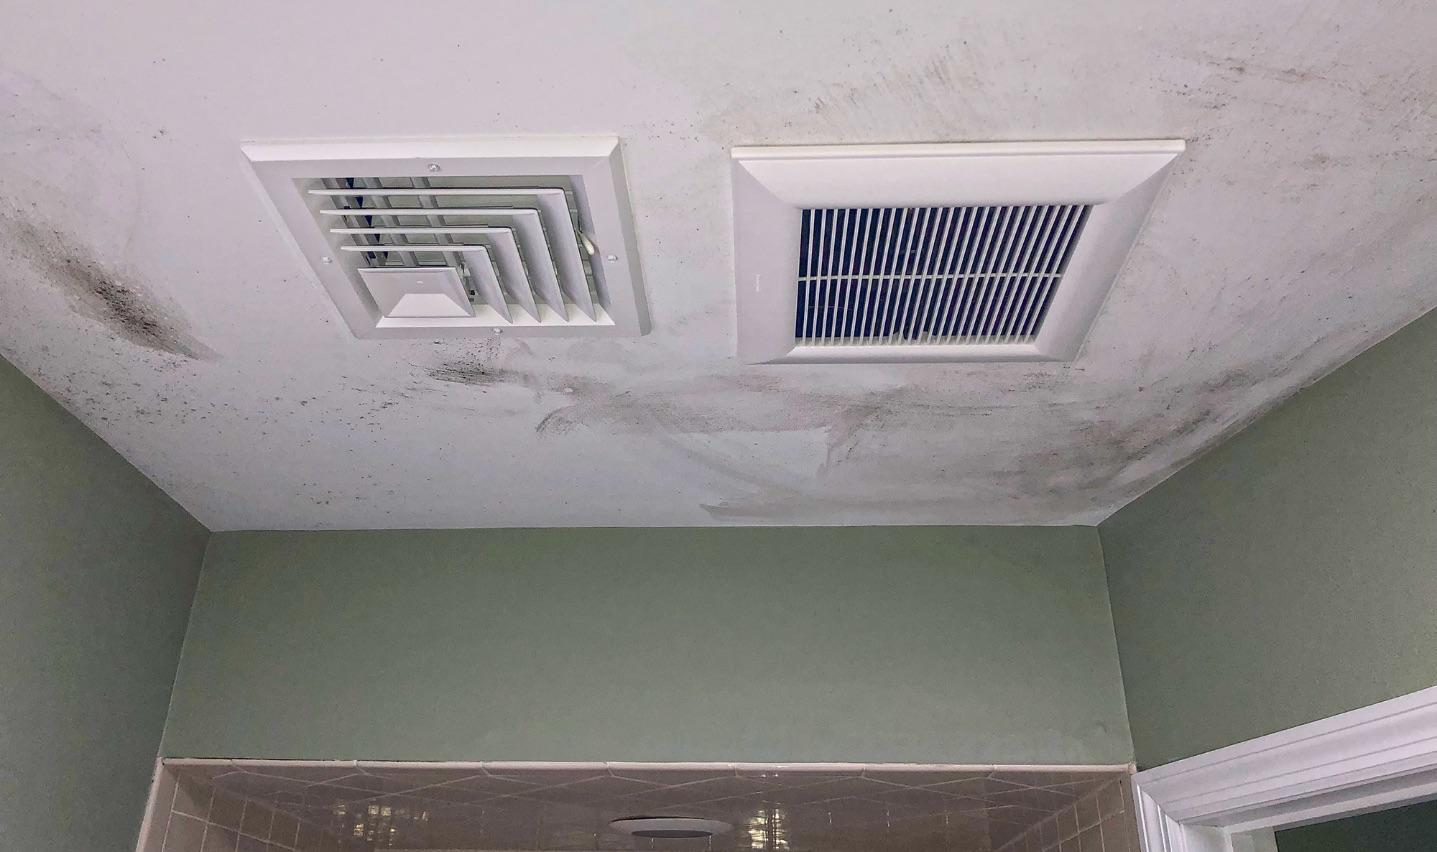 Bathroom Mold removal in Central NJ